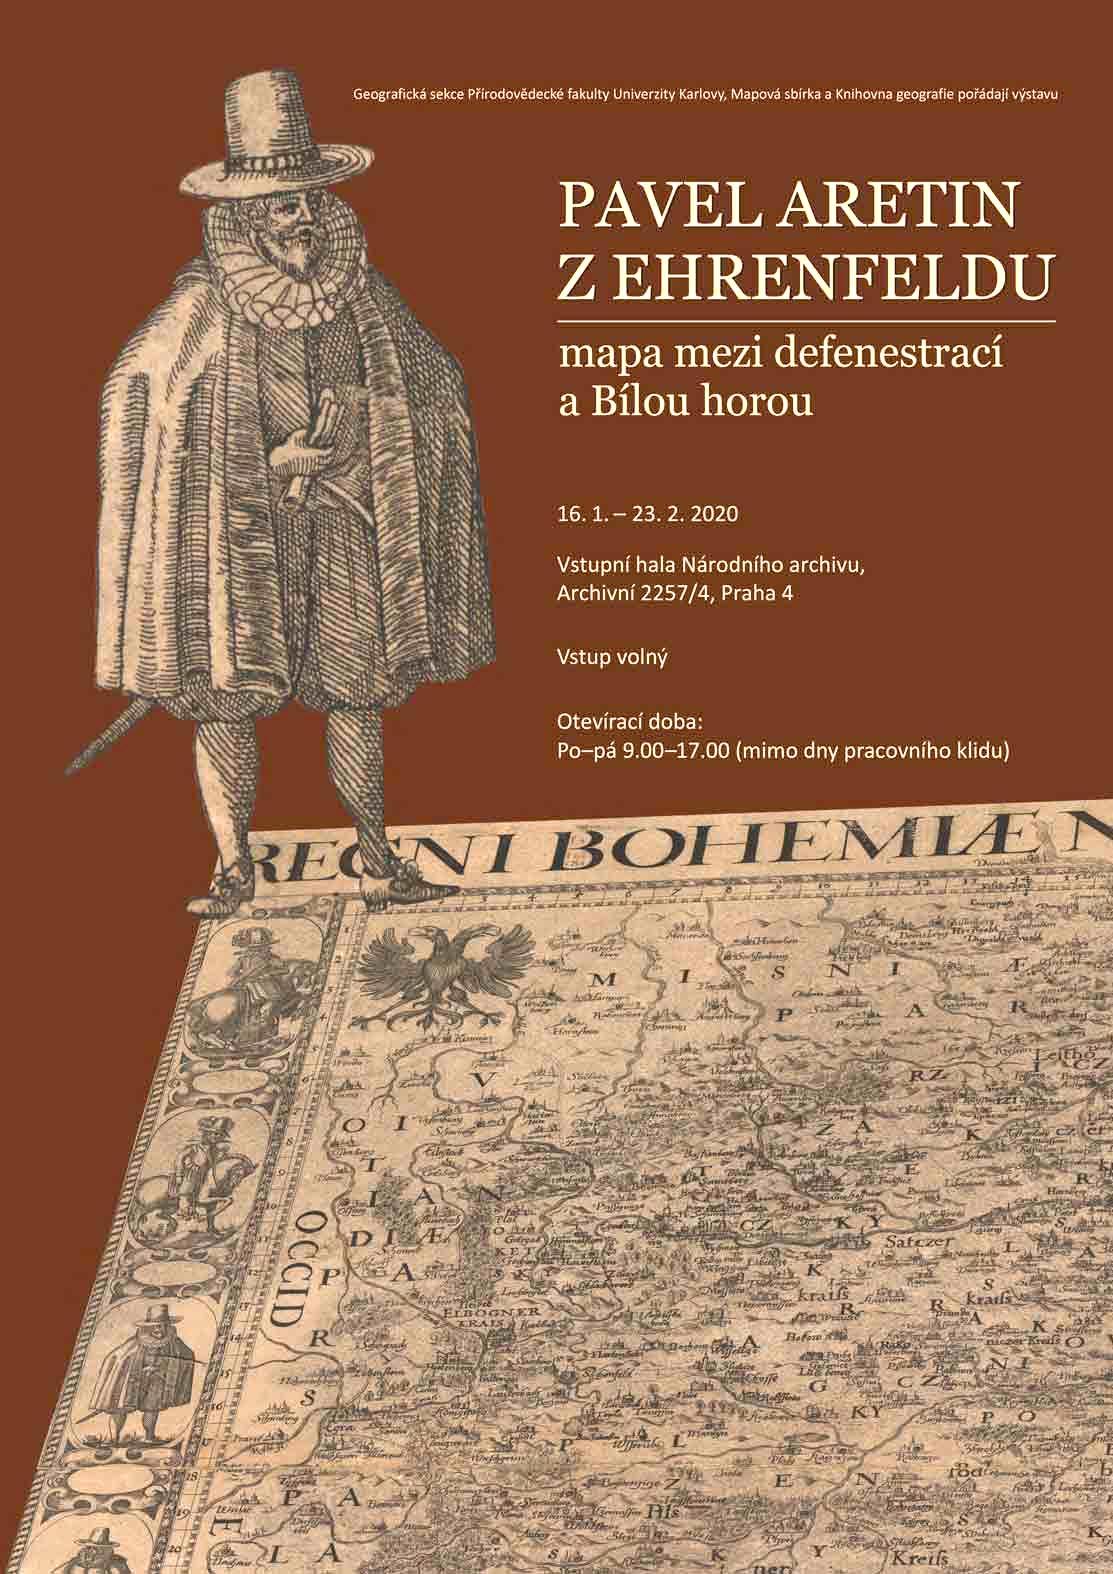 Pavel Aretin z Ehrenfeldu - plakátt